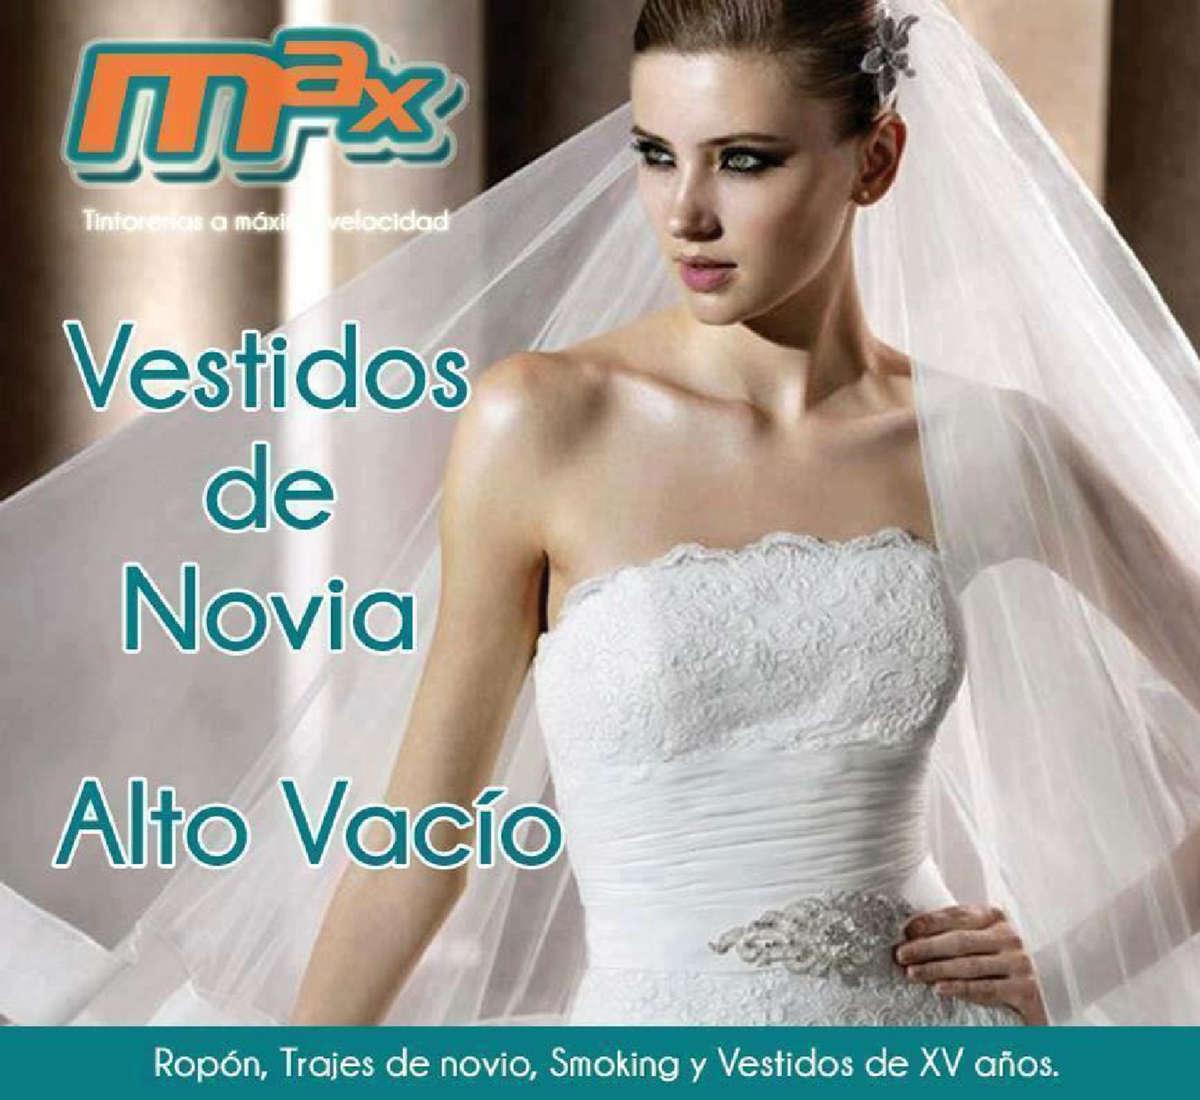 Vestidos de novia en polanco mexico df